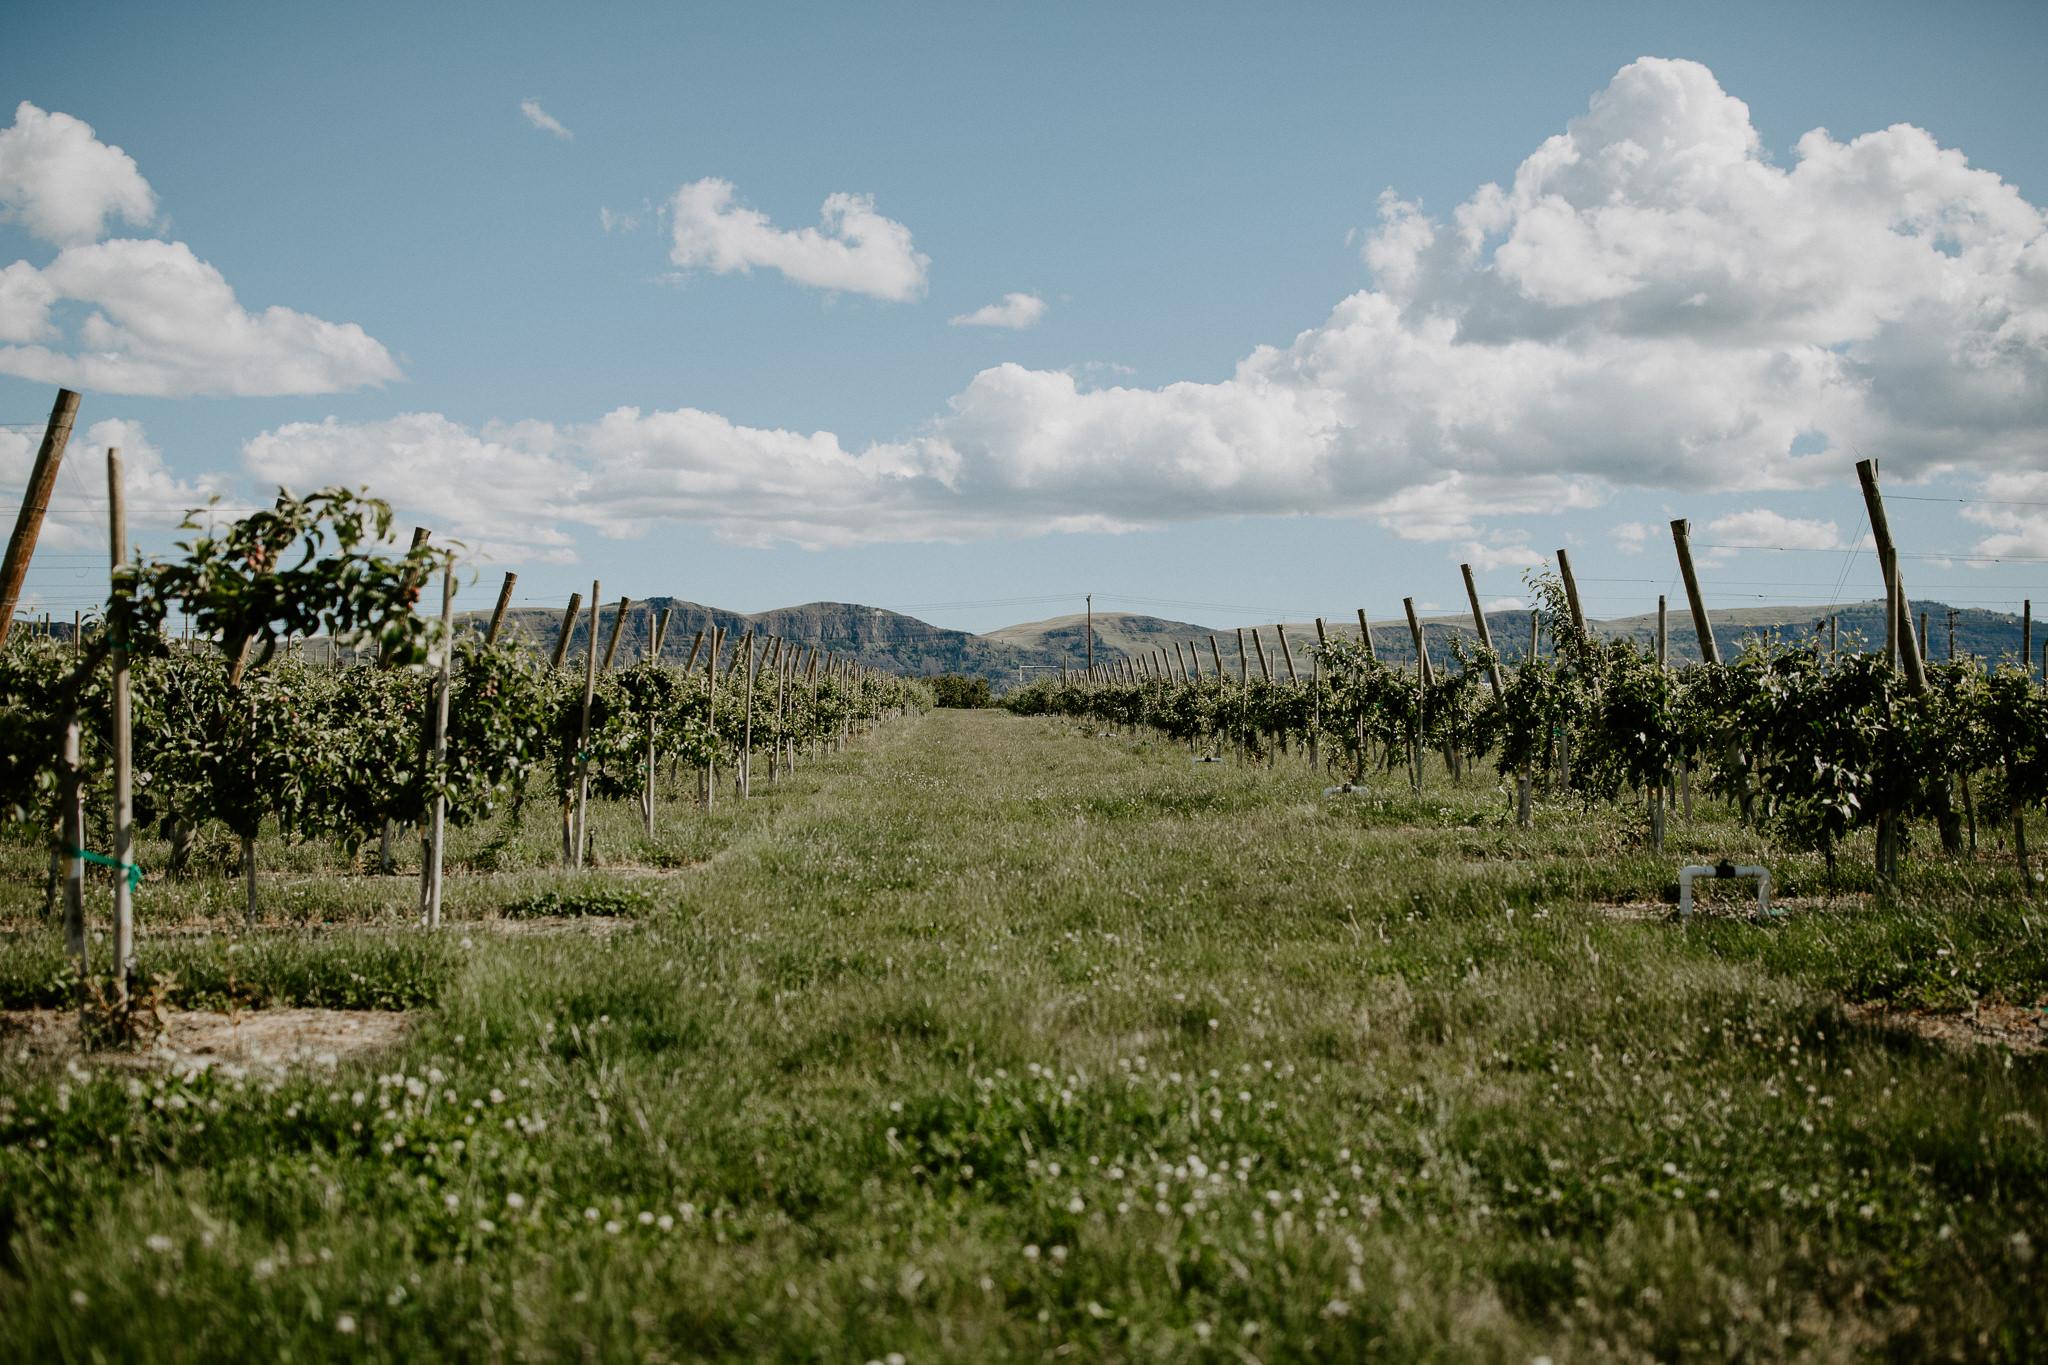 Landscapes of Wenatchee, Washington by Travel Photographer Allie Chambers